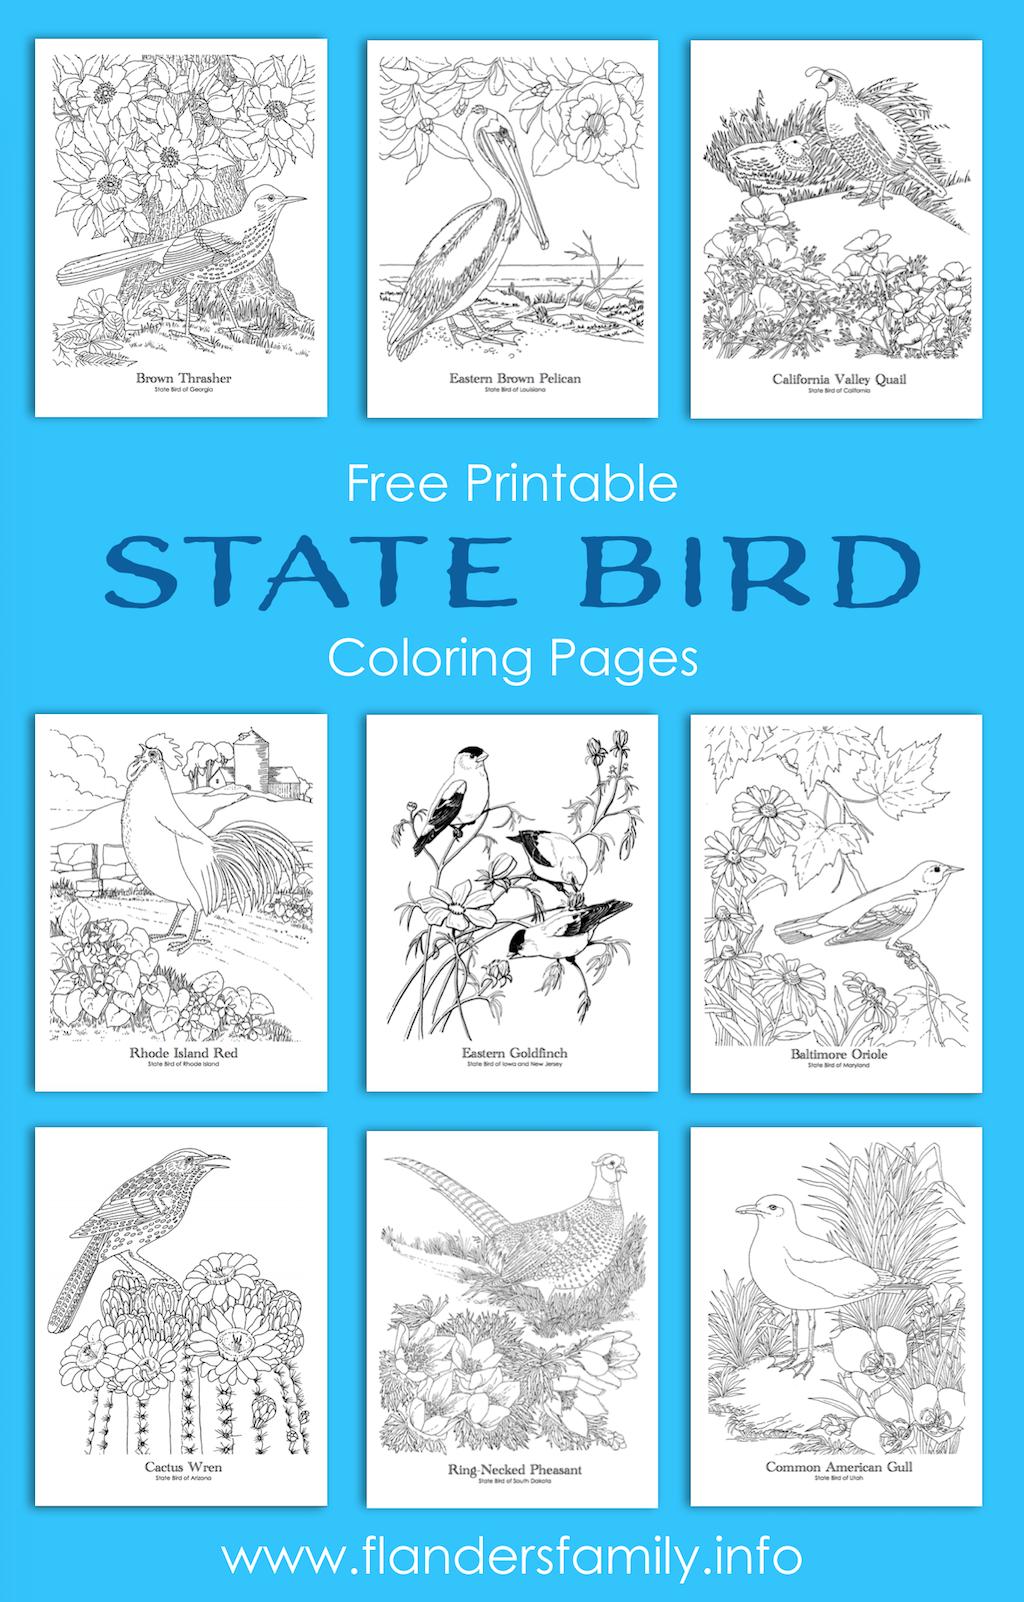 safari guide coloring pages ebook